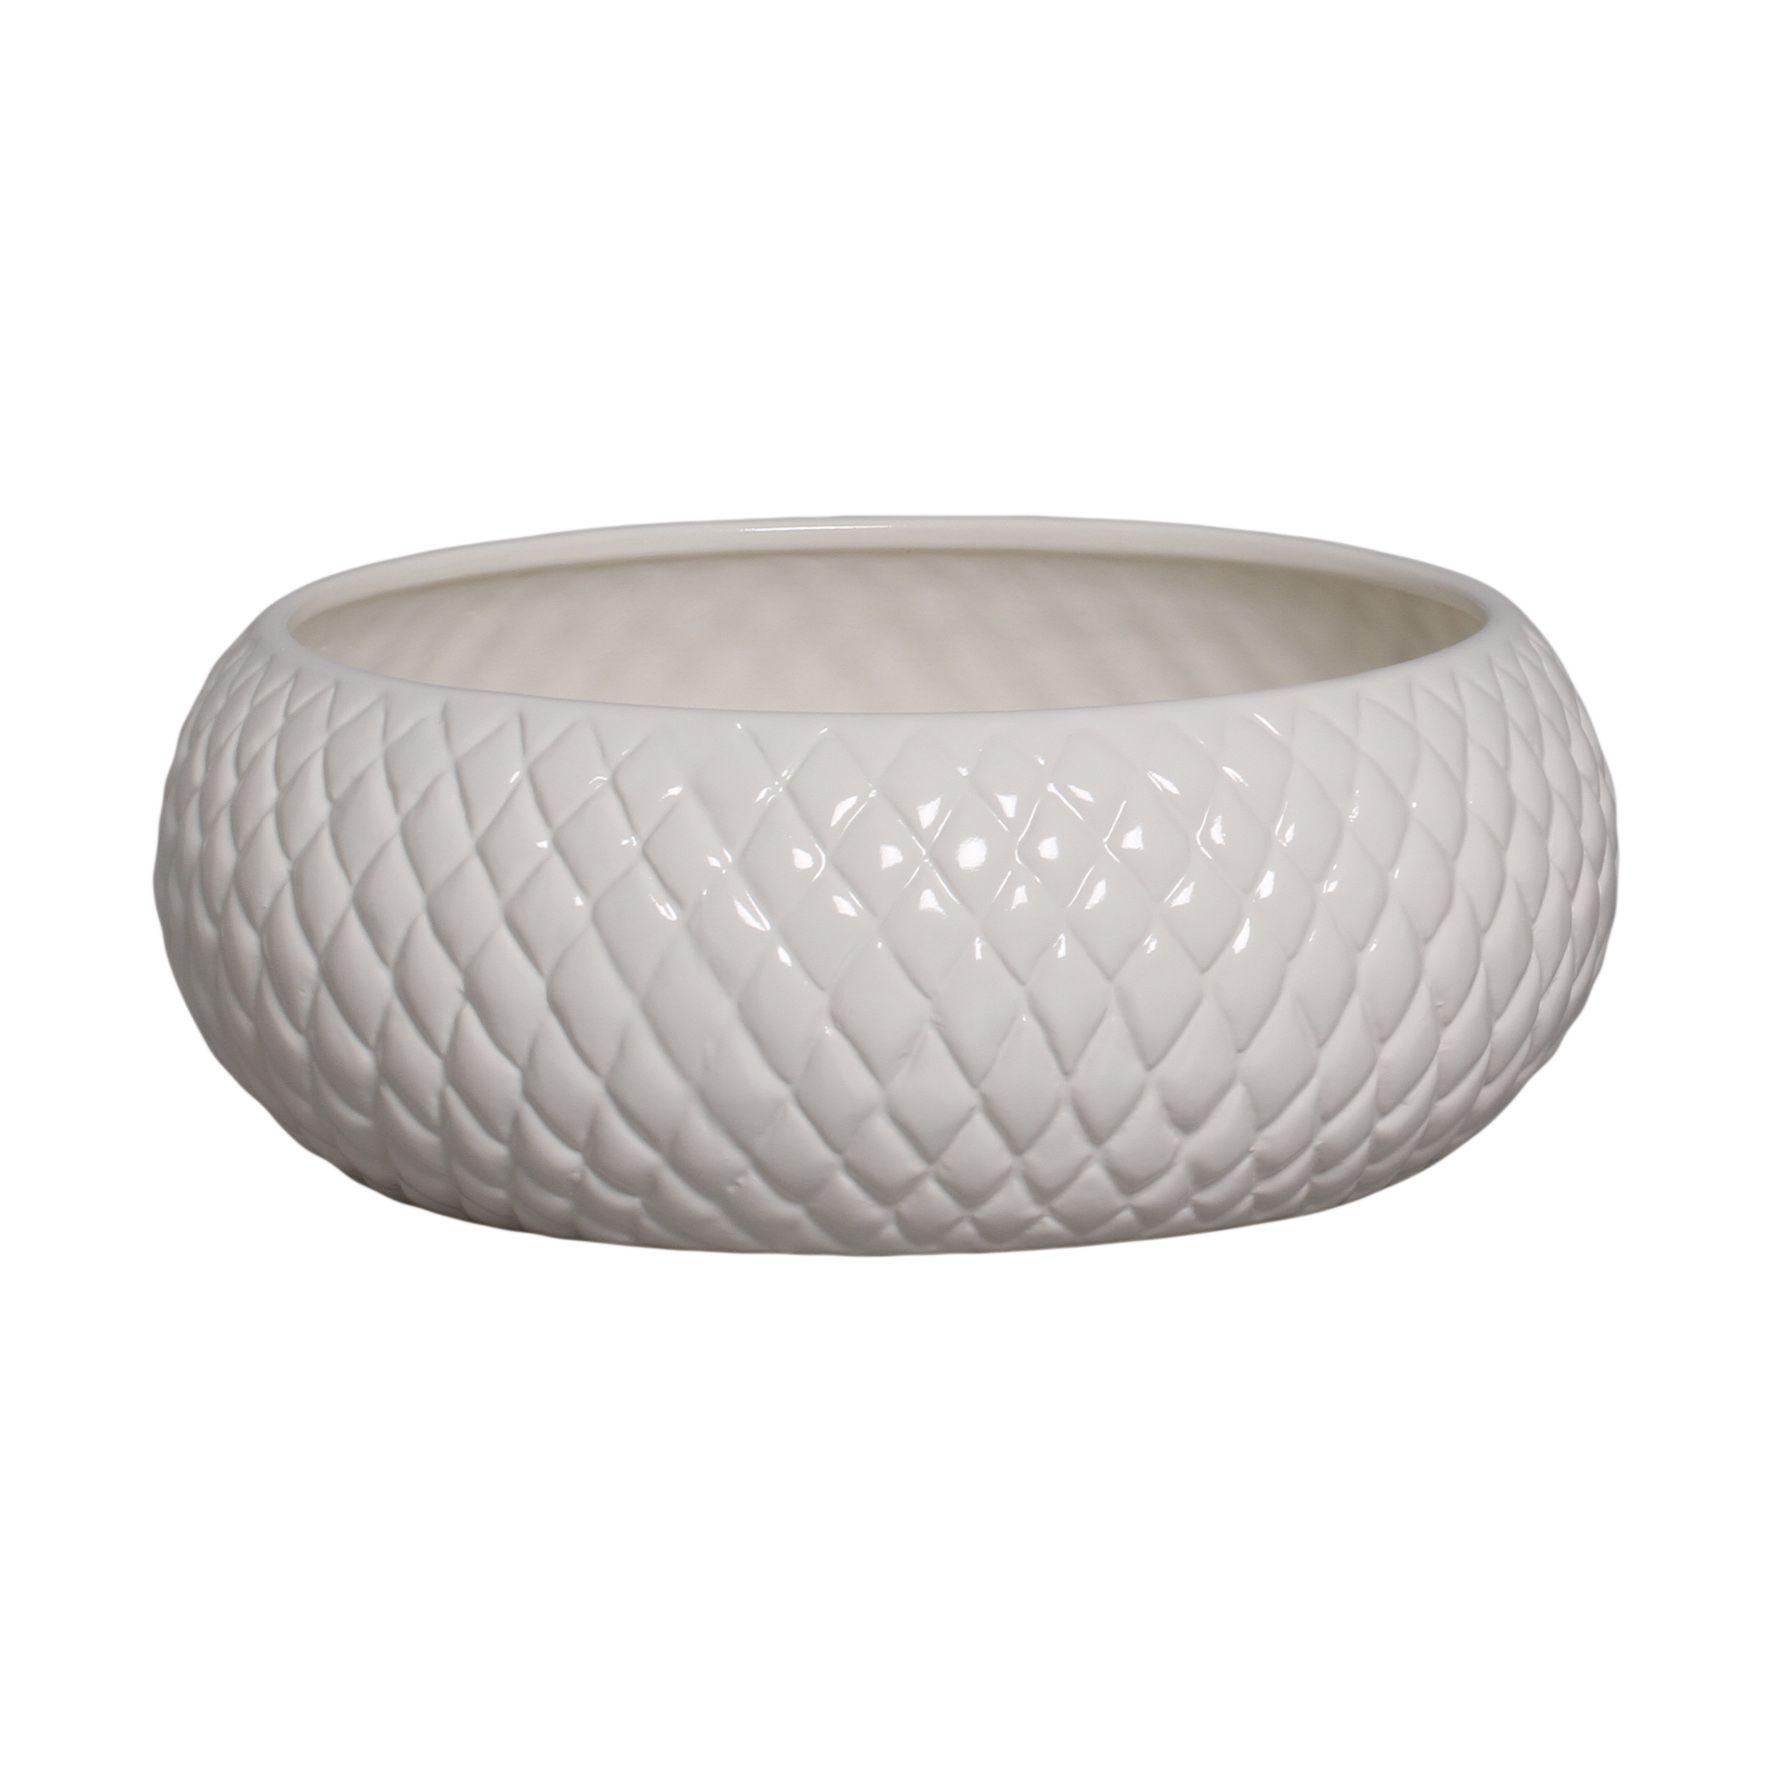 Cachepot de Cerâmica Crema Claro Boca Larga G 11,3 x 30,2 cm